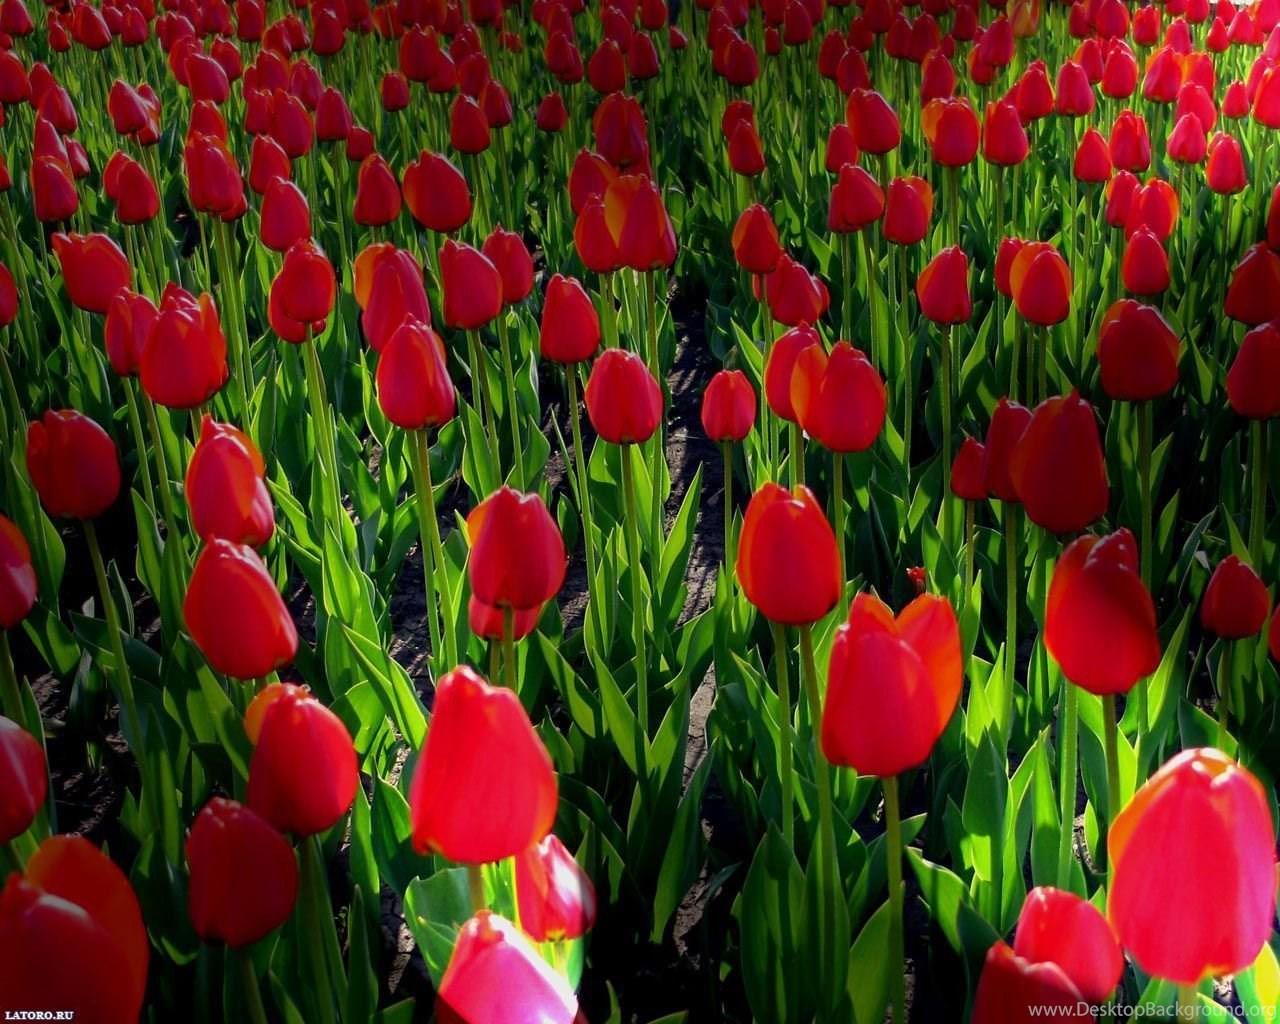 Free desktop wallpaper backgrounds spring flowers desktop background widescreen mightylinksfo